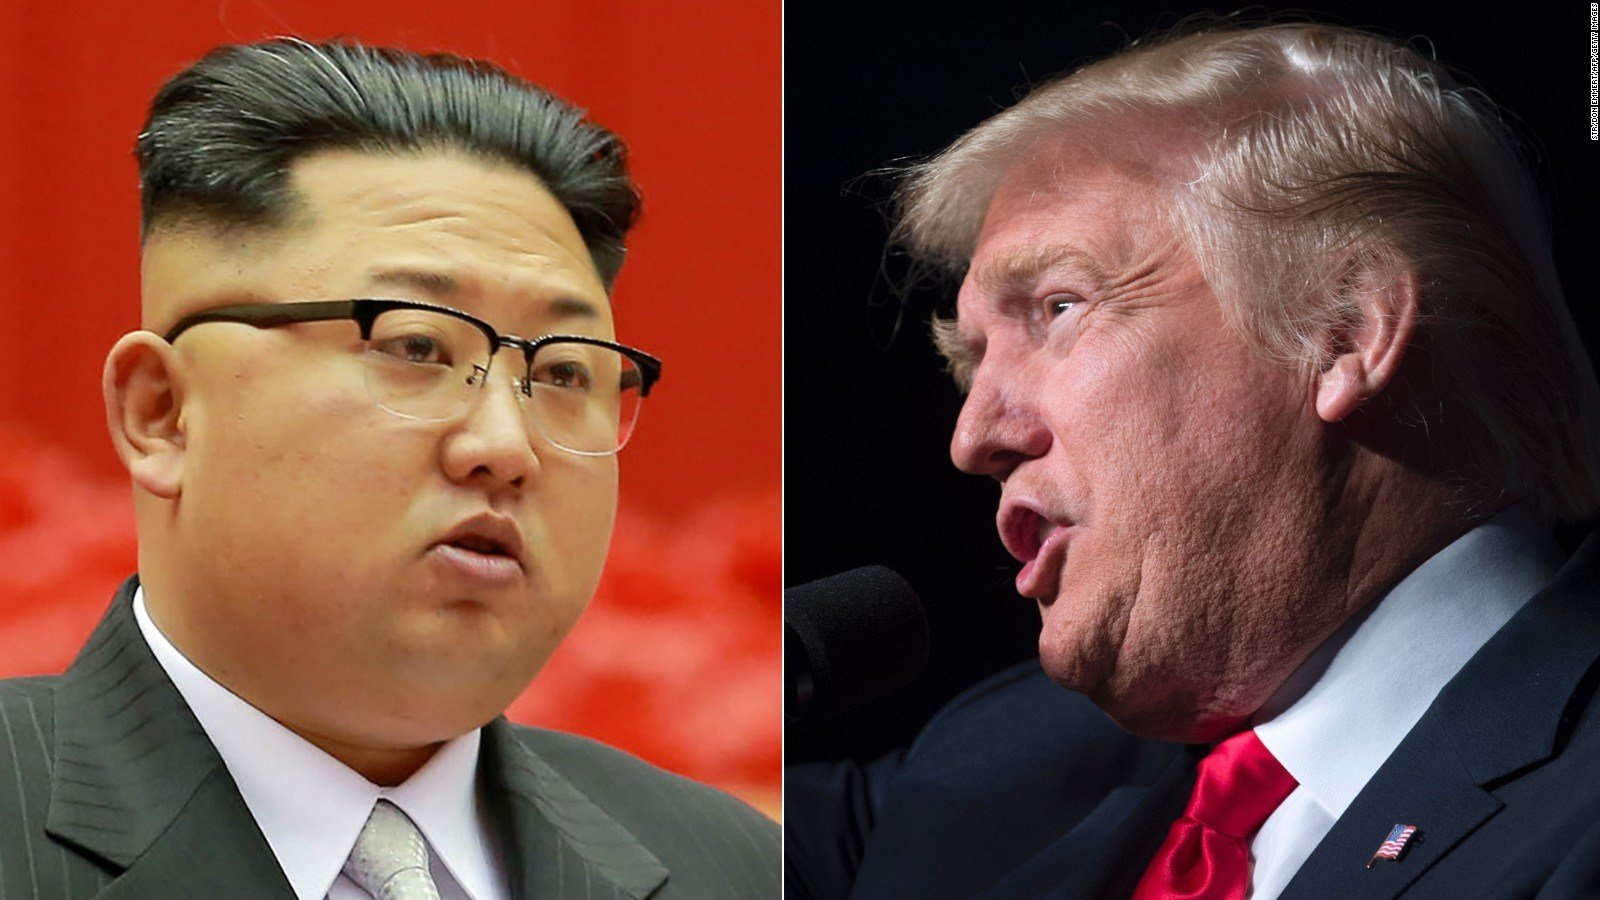 Kim Jong Un/President Trump (CNN)